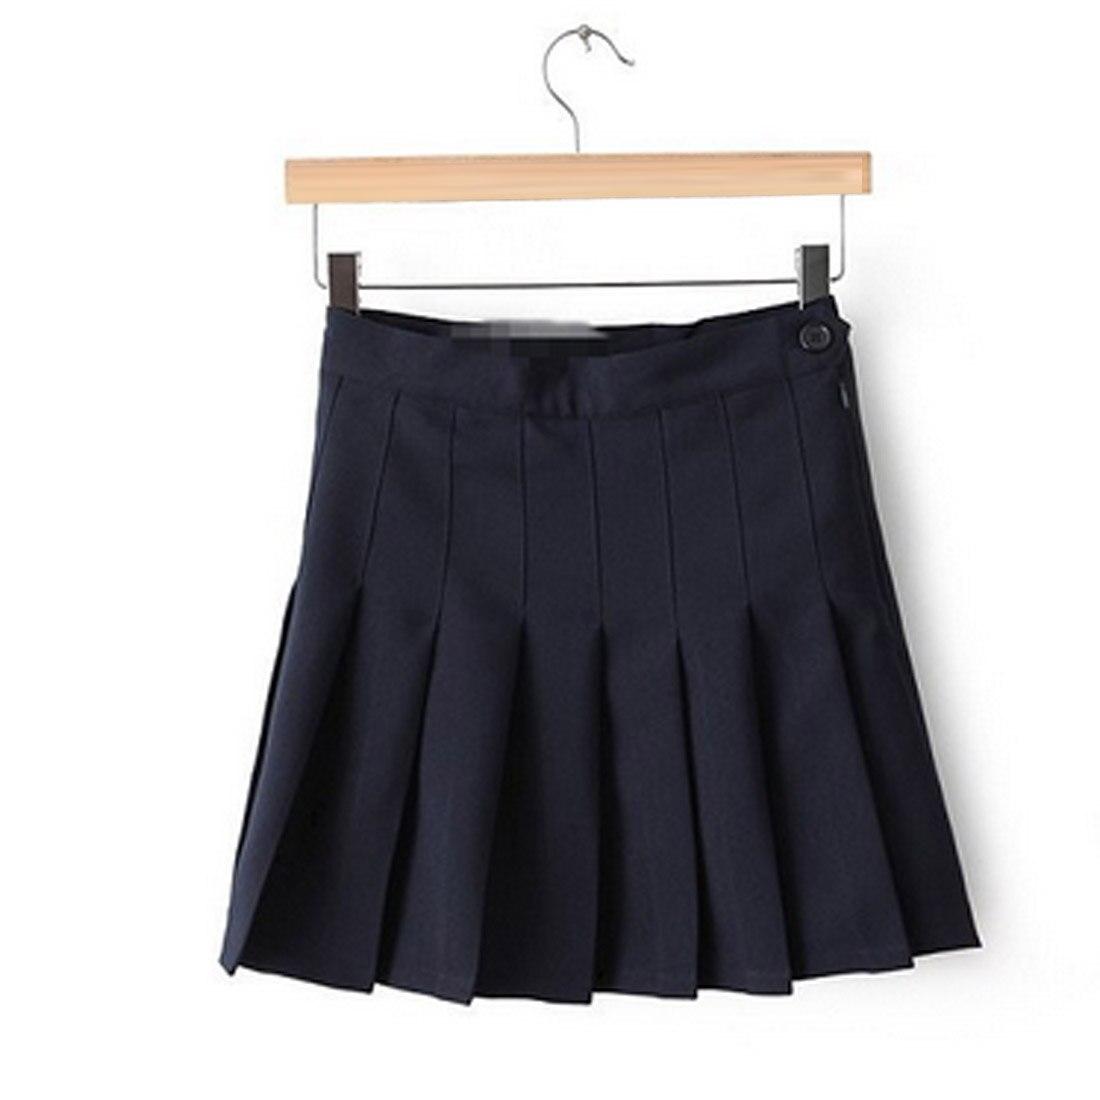 Fashion Women Lady Cute High Waist Plain Skater Flared Pleated Short Mini Skirt Shorts High Quality Comfortable